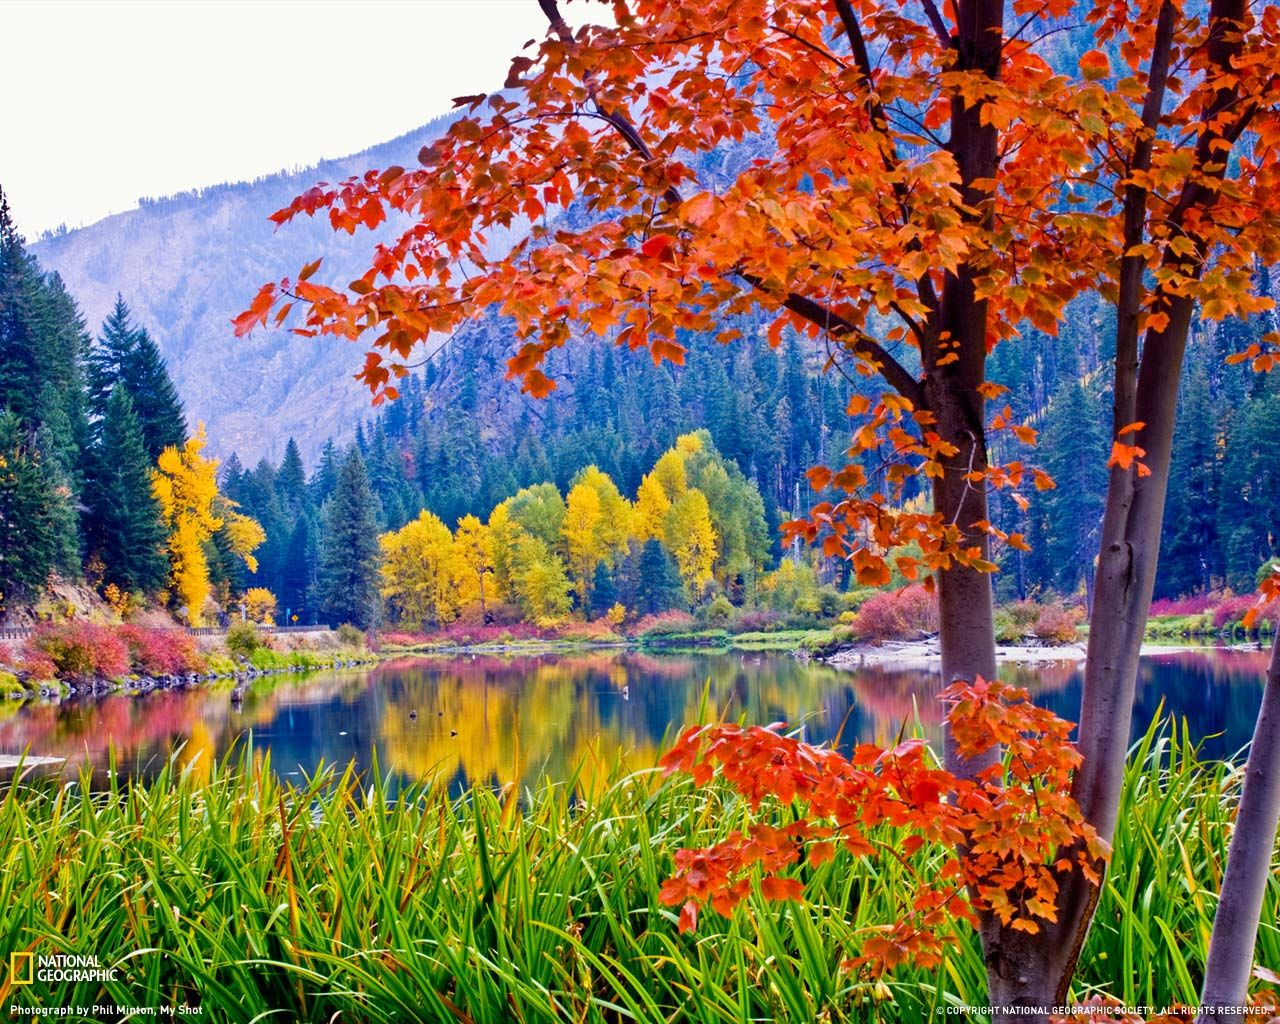 Fall Foliage Wallpapers For Desktop Wallpaper Cave Fall Wallpaper Beautiful Nature Nature Photos